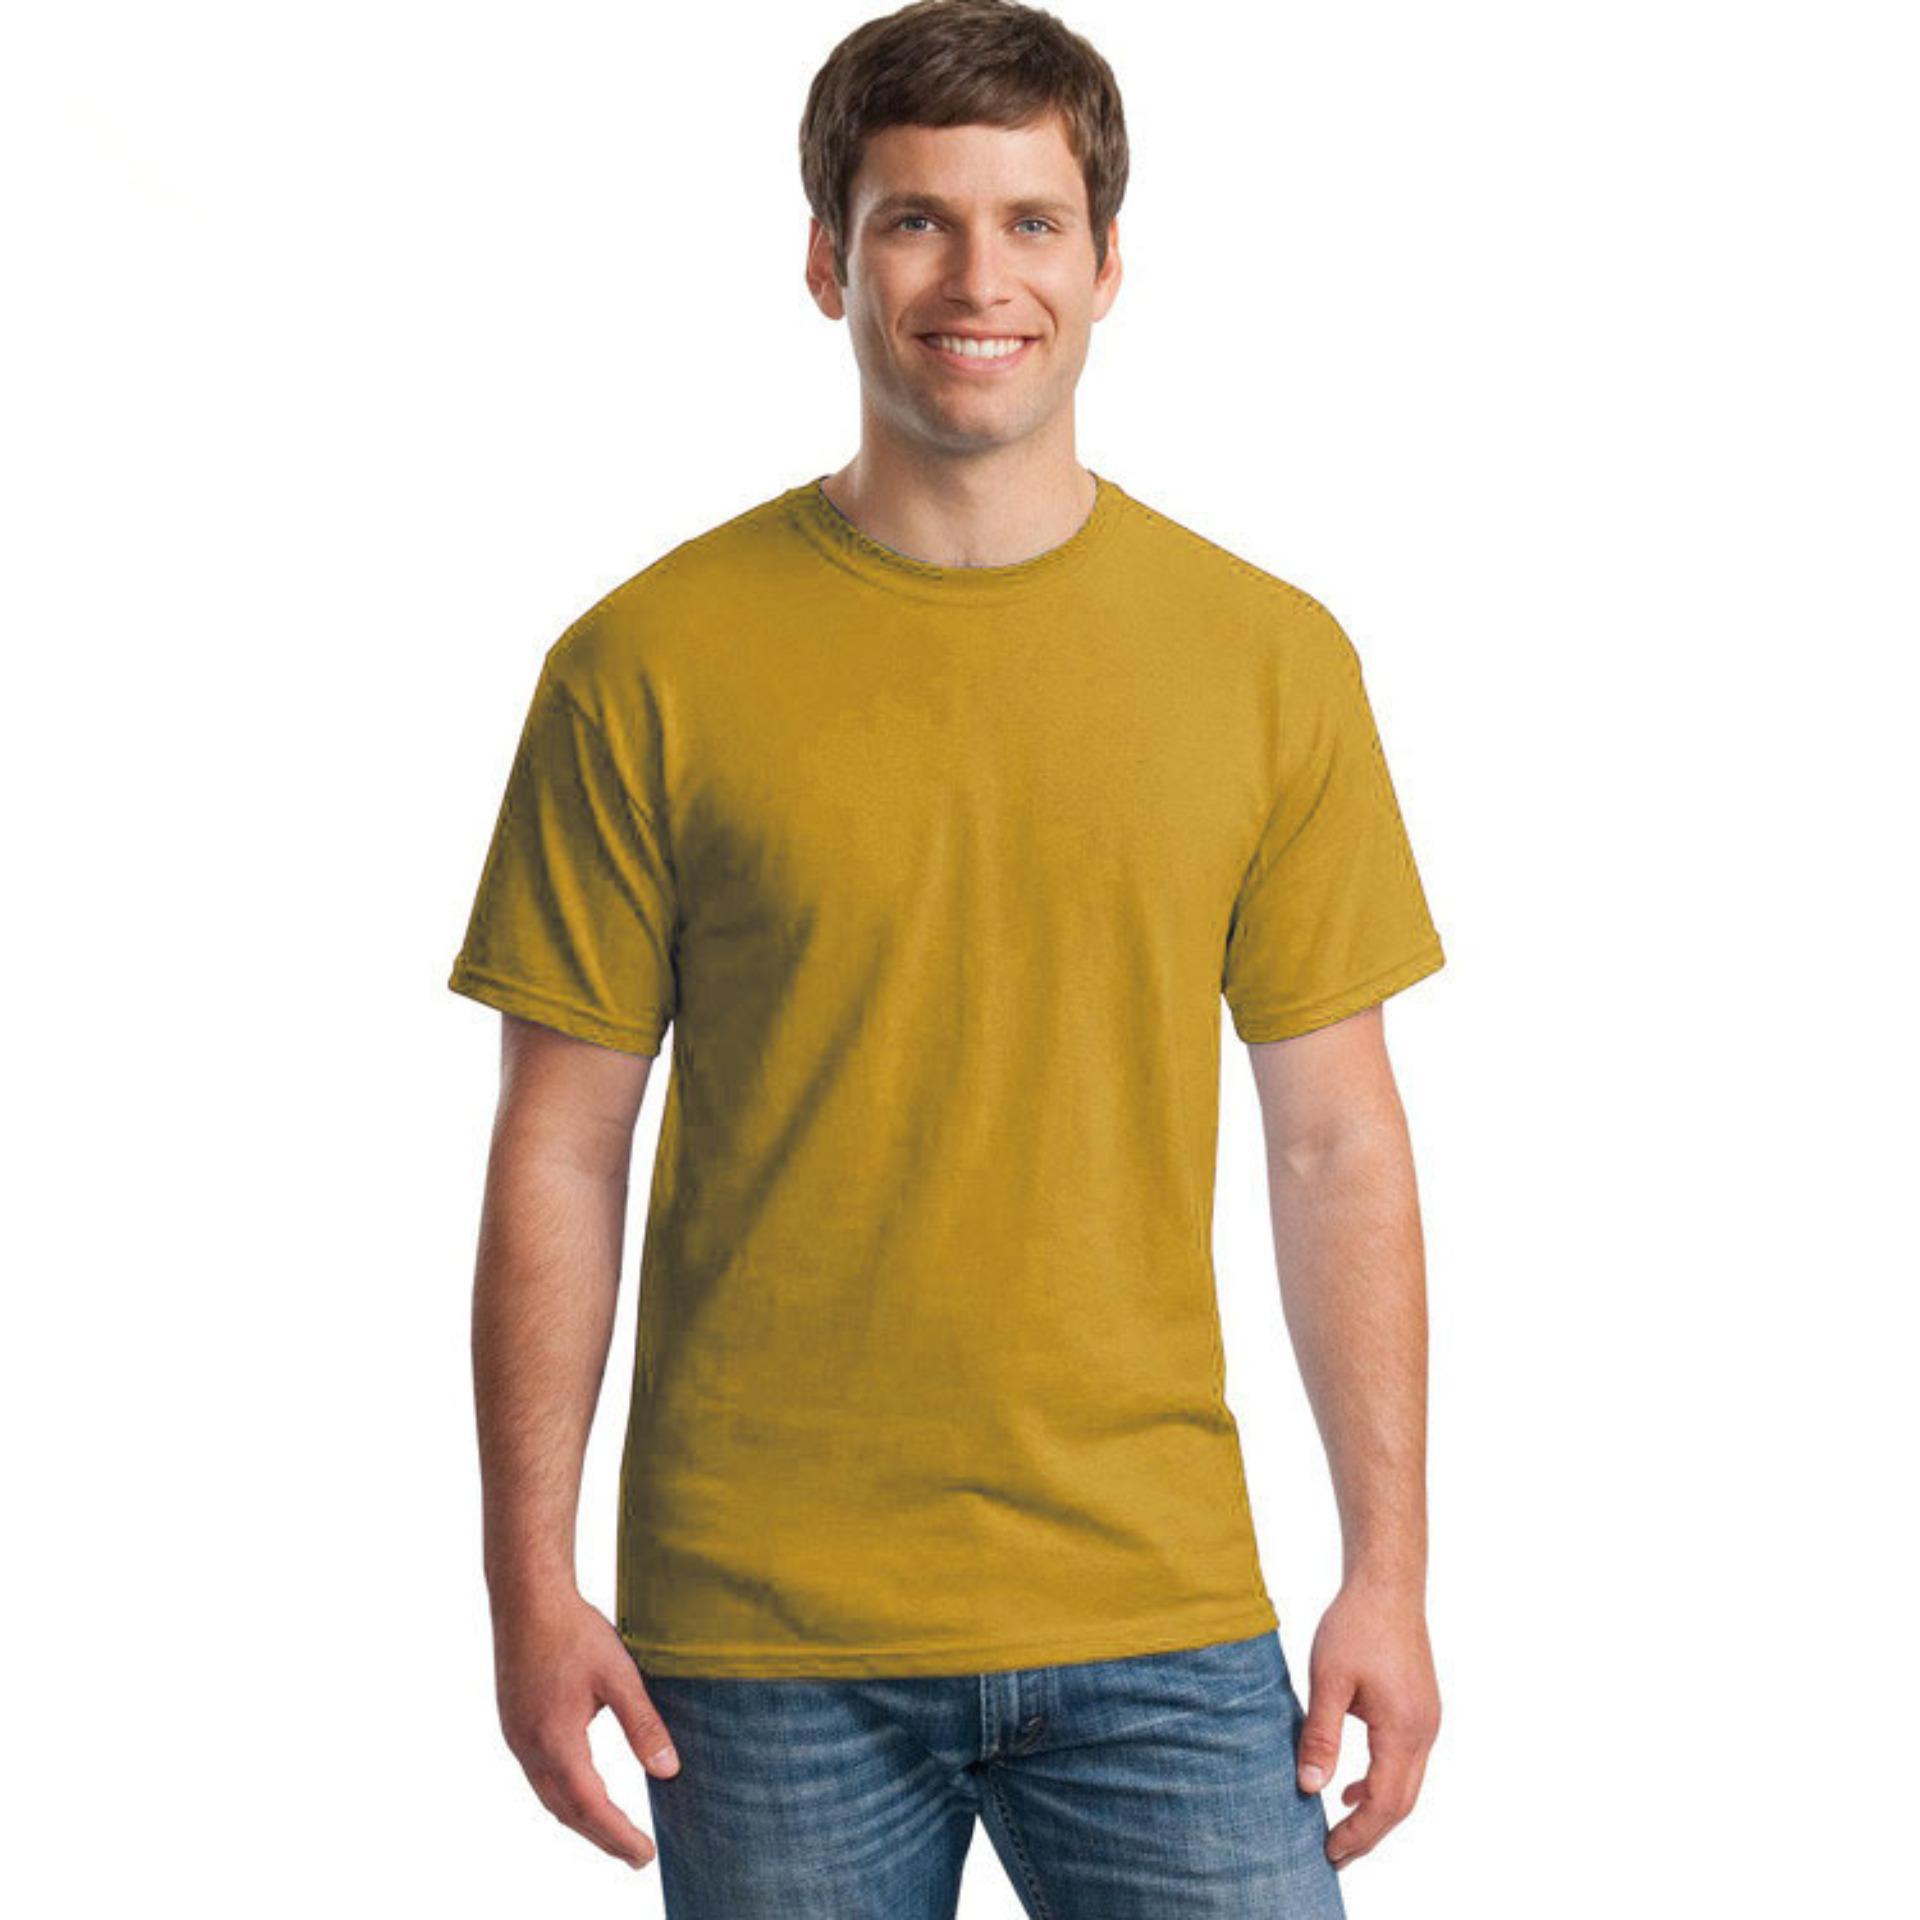 T Shirt Kaos Polos O Neck Pria Katun Bambu Keren Hijau Army Daftar Ramayana Raf Tshirt Hitam Titanium Xl Mustard